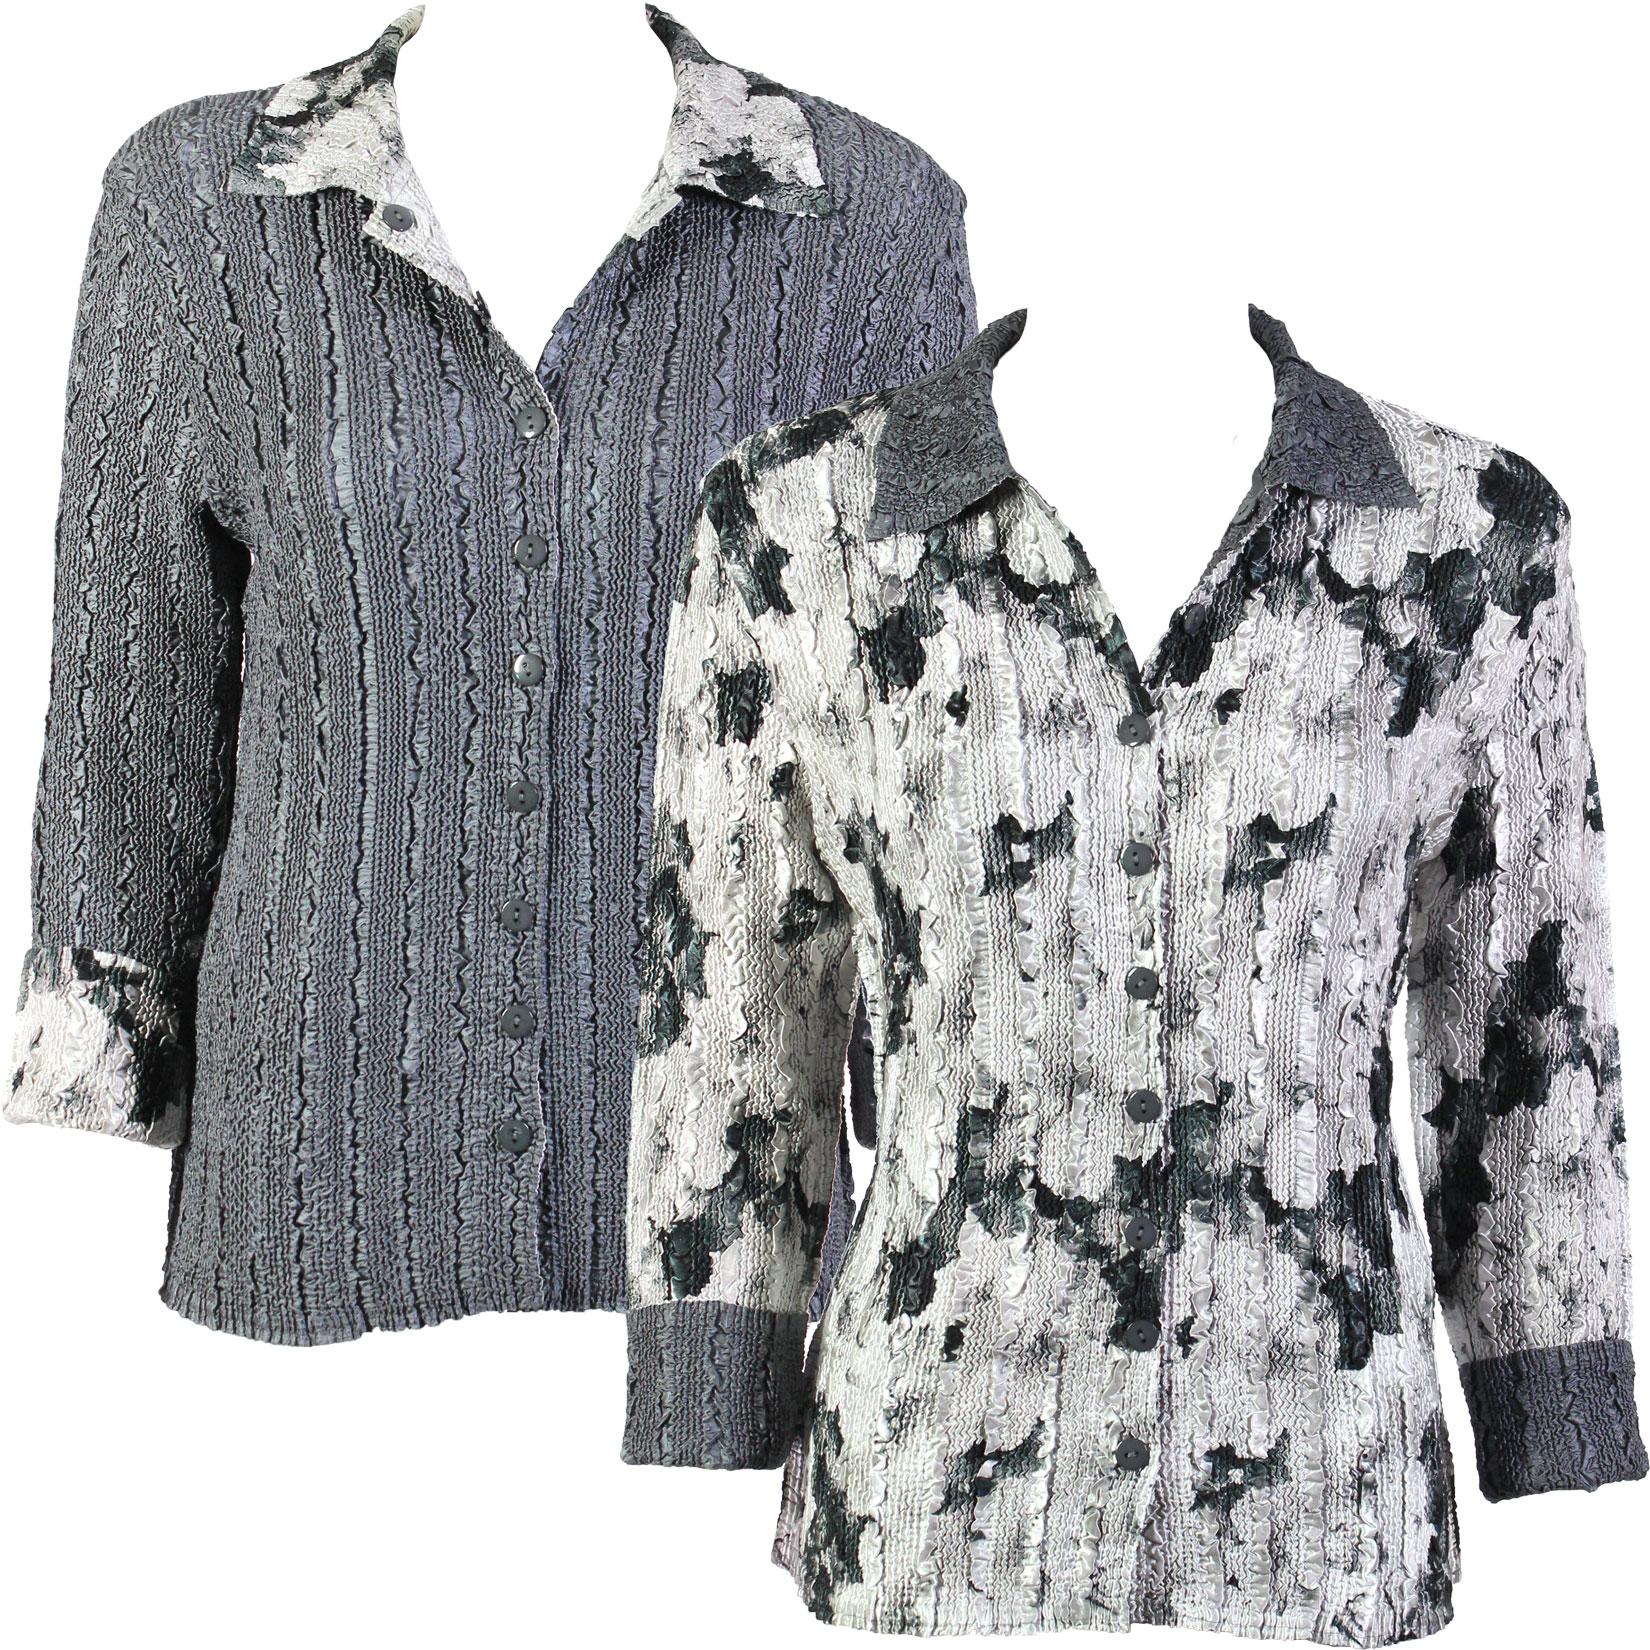 Wholesale Magic Crush - Reversible Jackets #5670 - 1X-2X